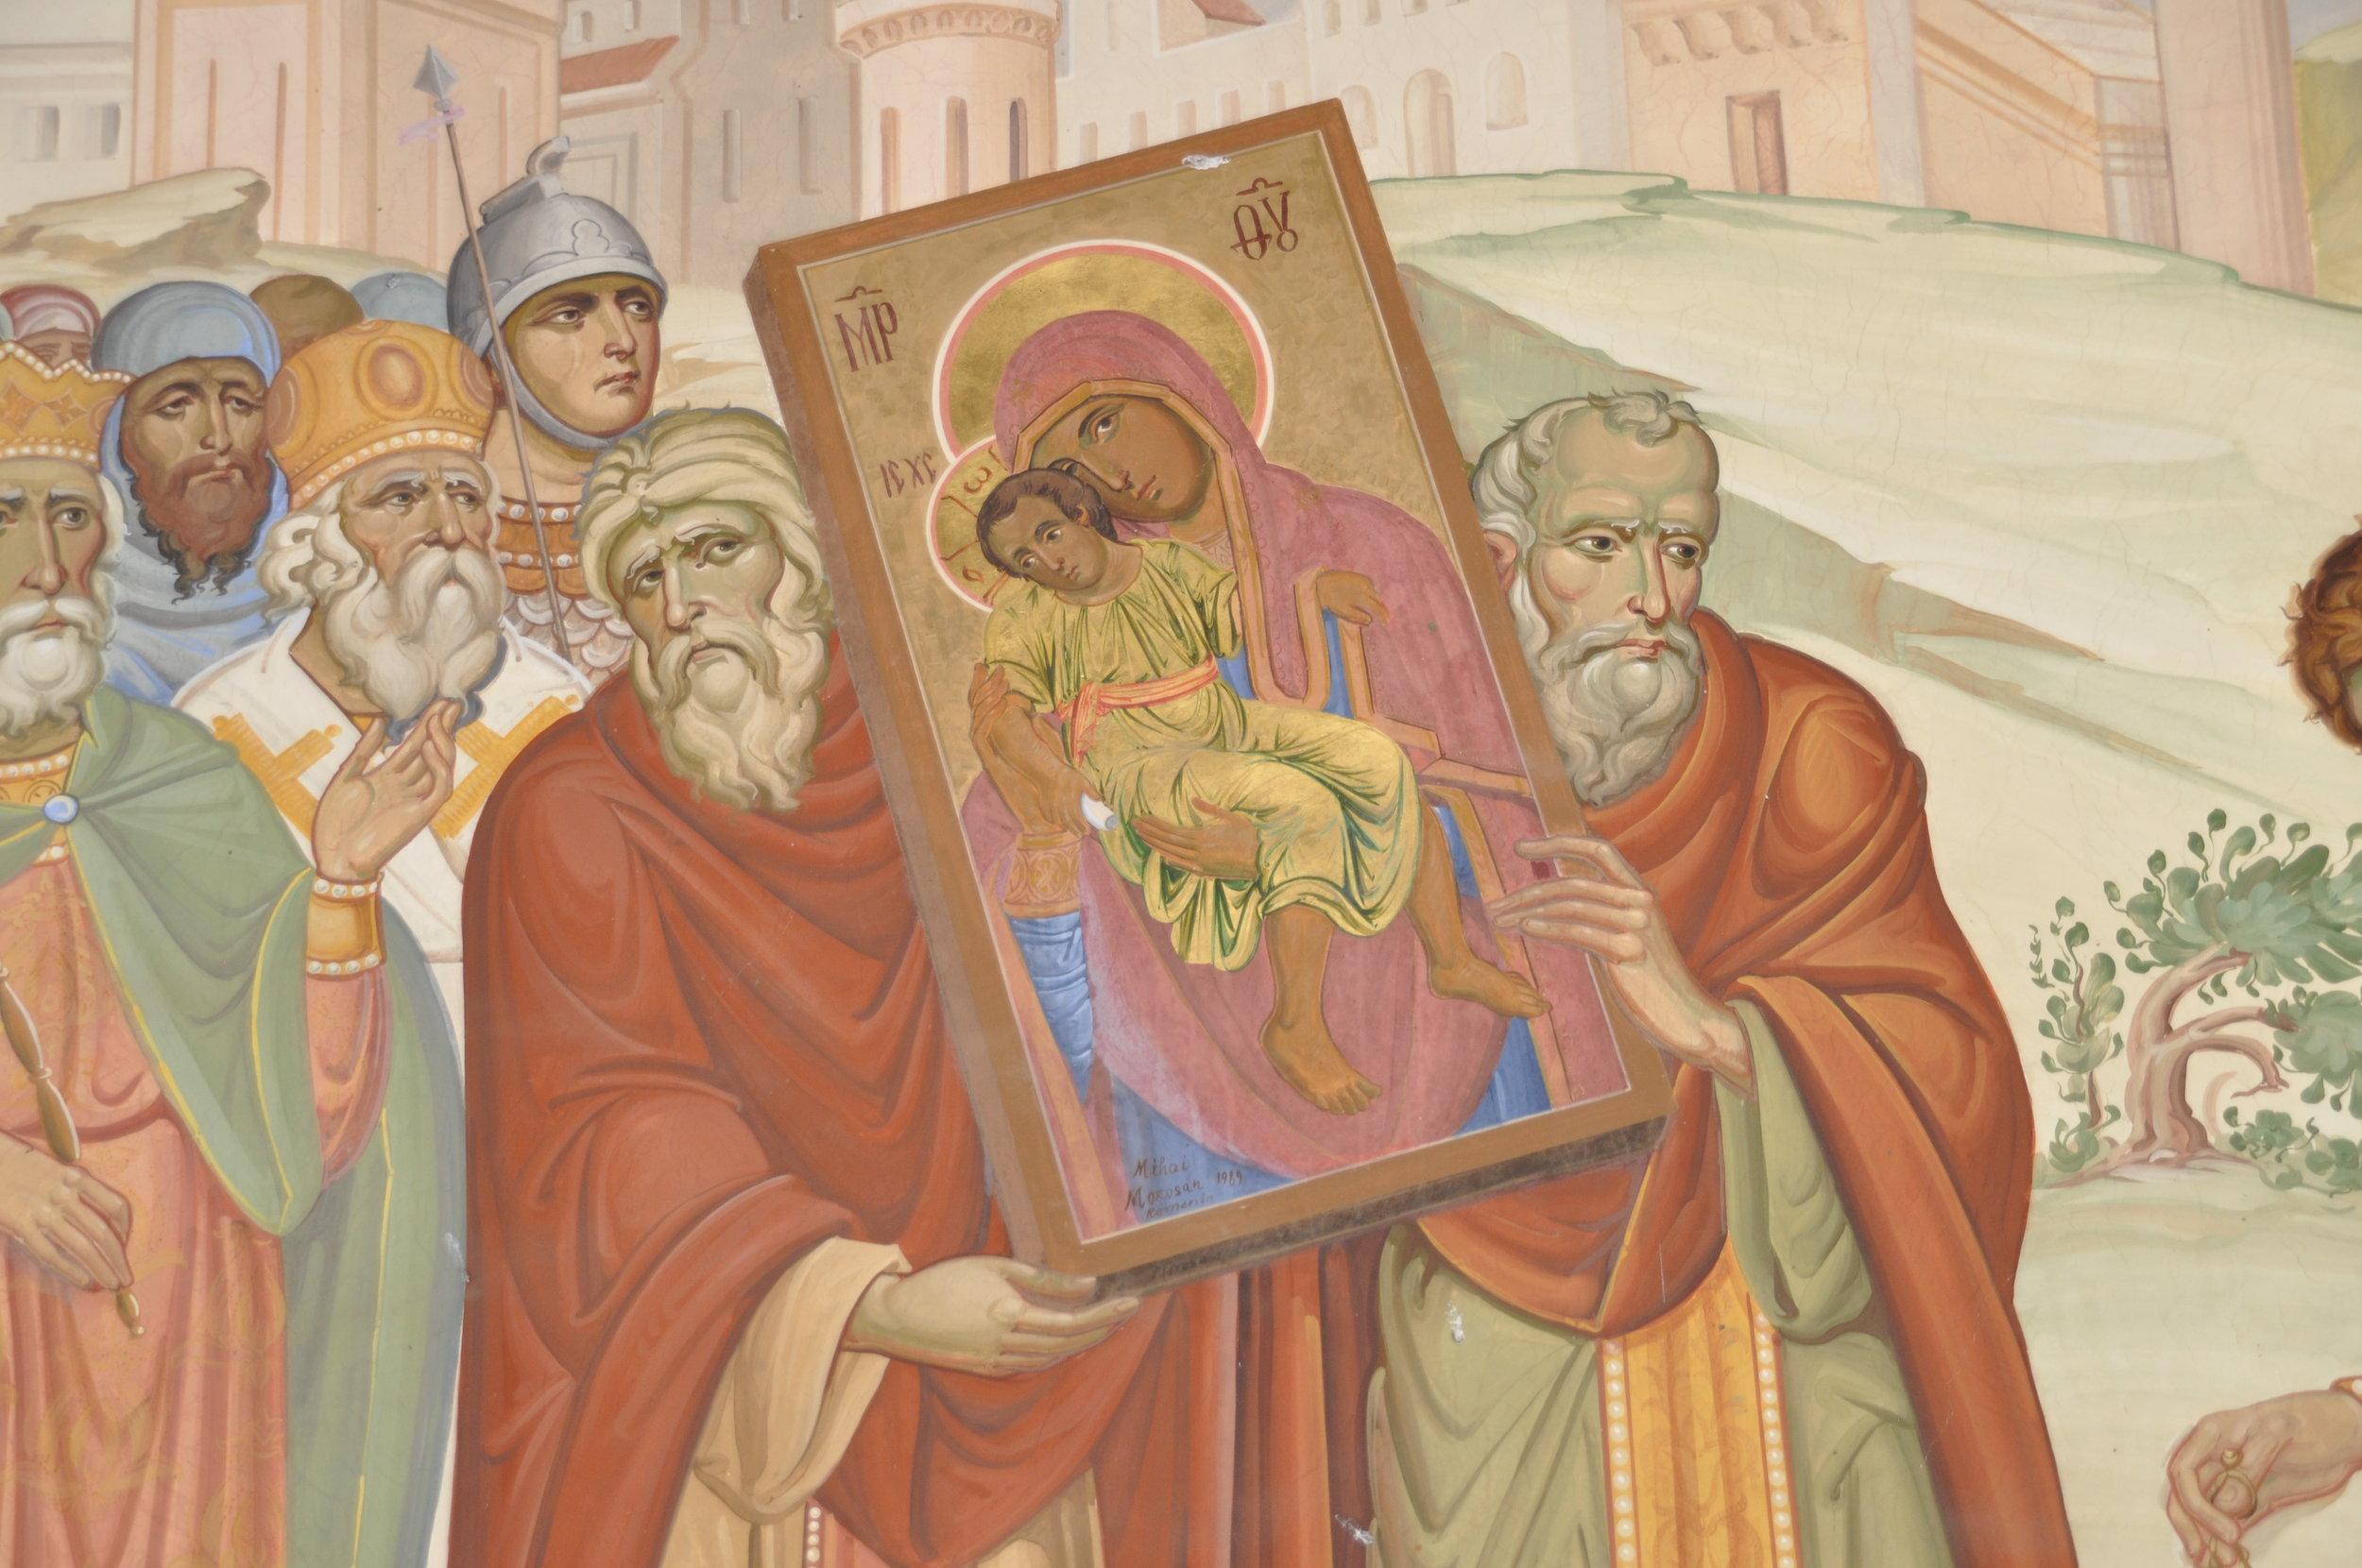 Frescoes at Kykkos Monastery reveal the legends behind its founding. Photos: Meg Pier